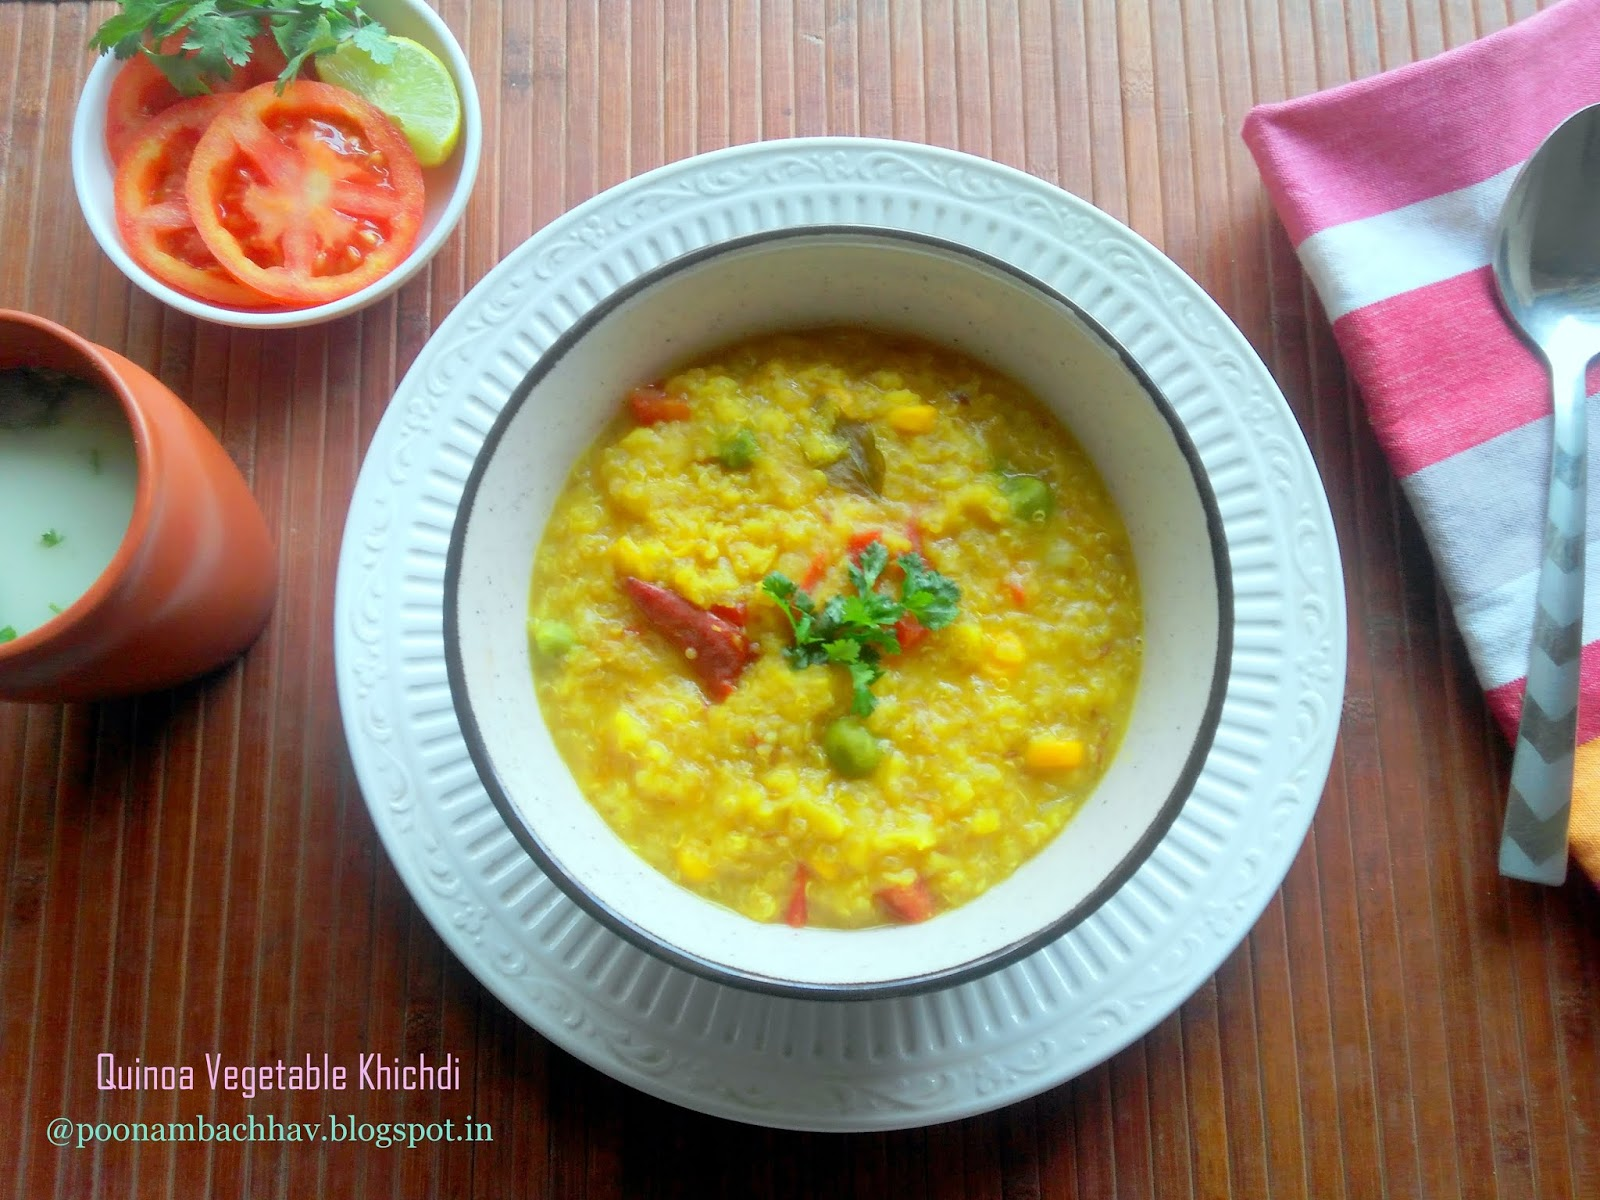 annapurna: quinoa vegetable khichdi recipe